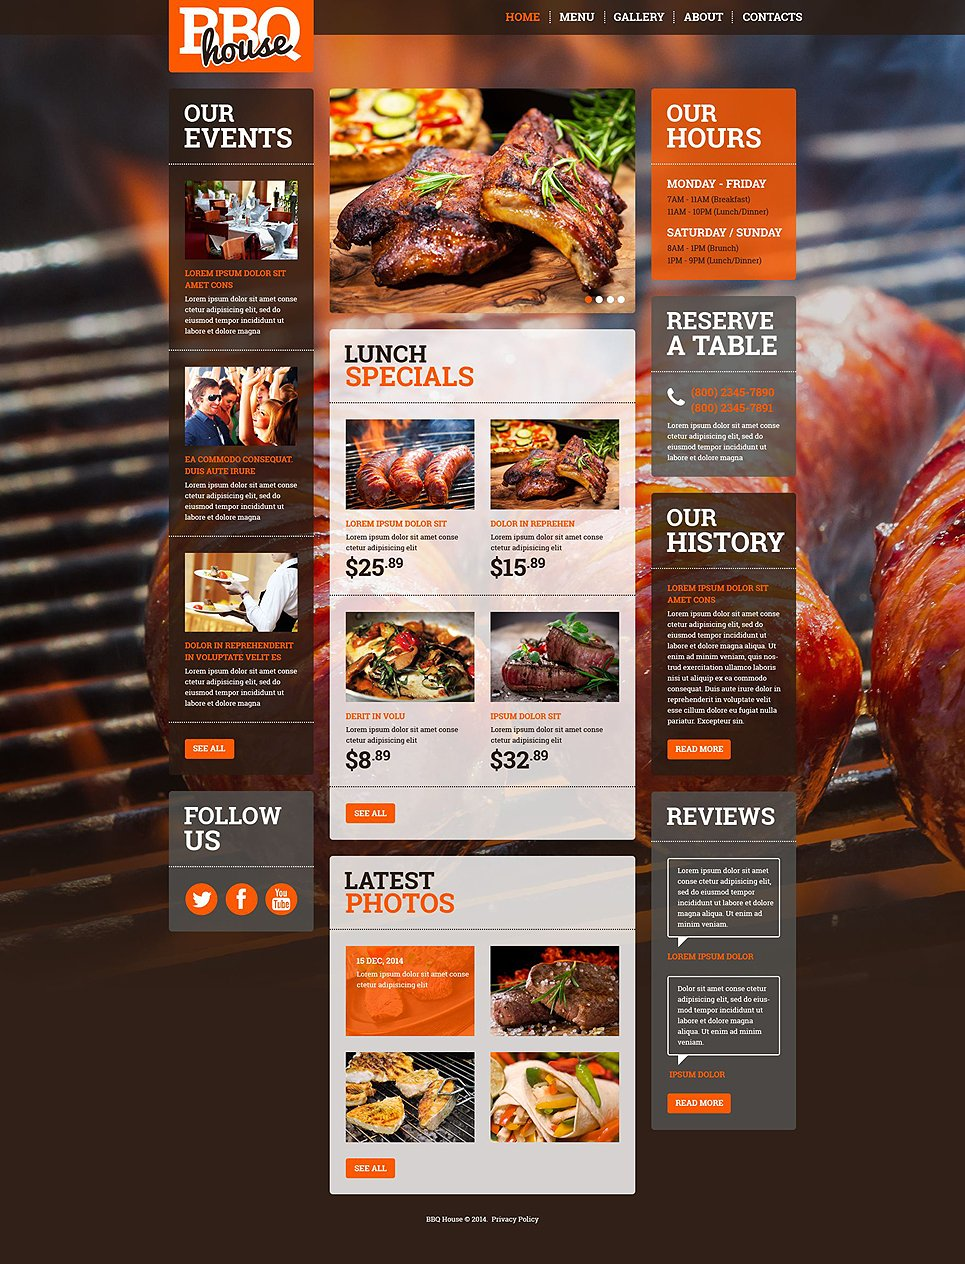 bbq restaurant responsive website template 52378. Black Bedroom Furniture Sets. Home Design Ideas